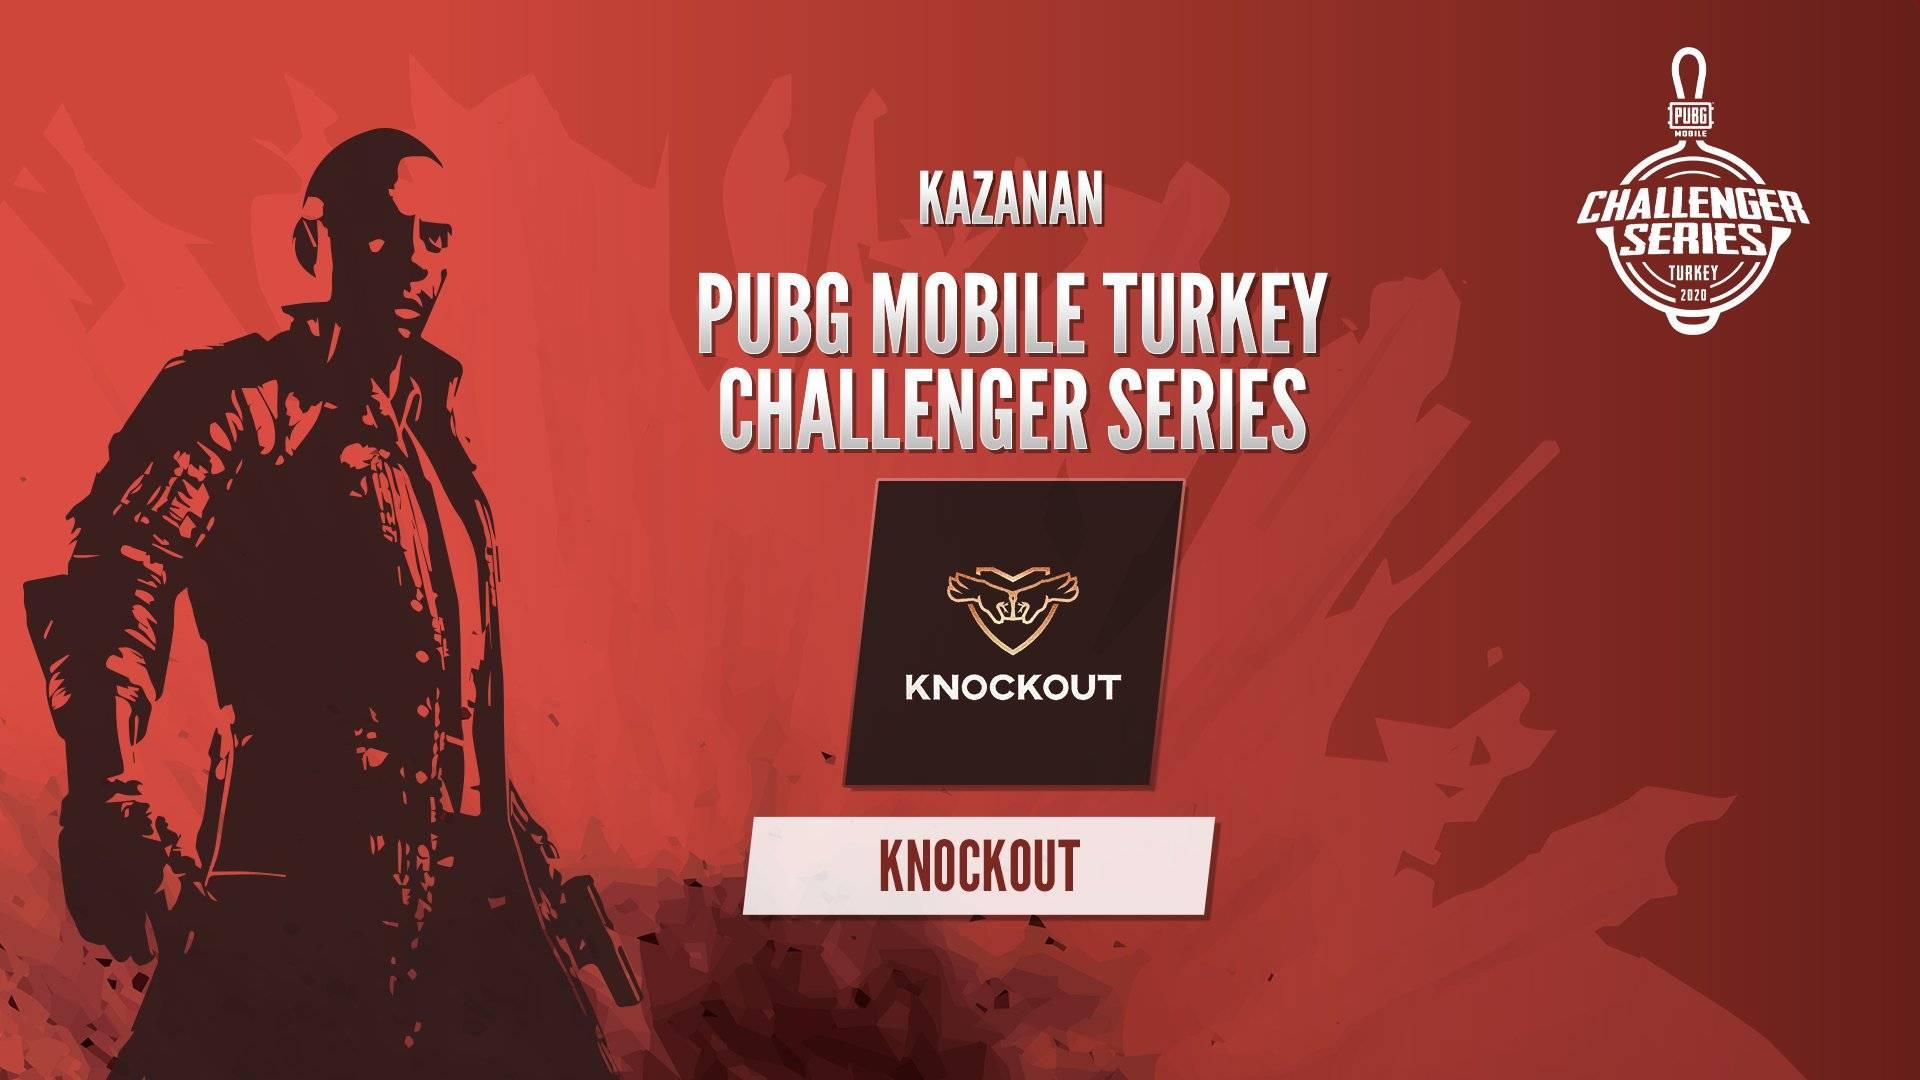 pubg mobile turkiye challenger series knockout